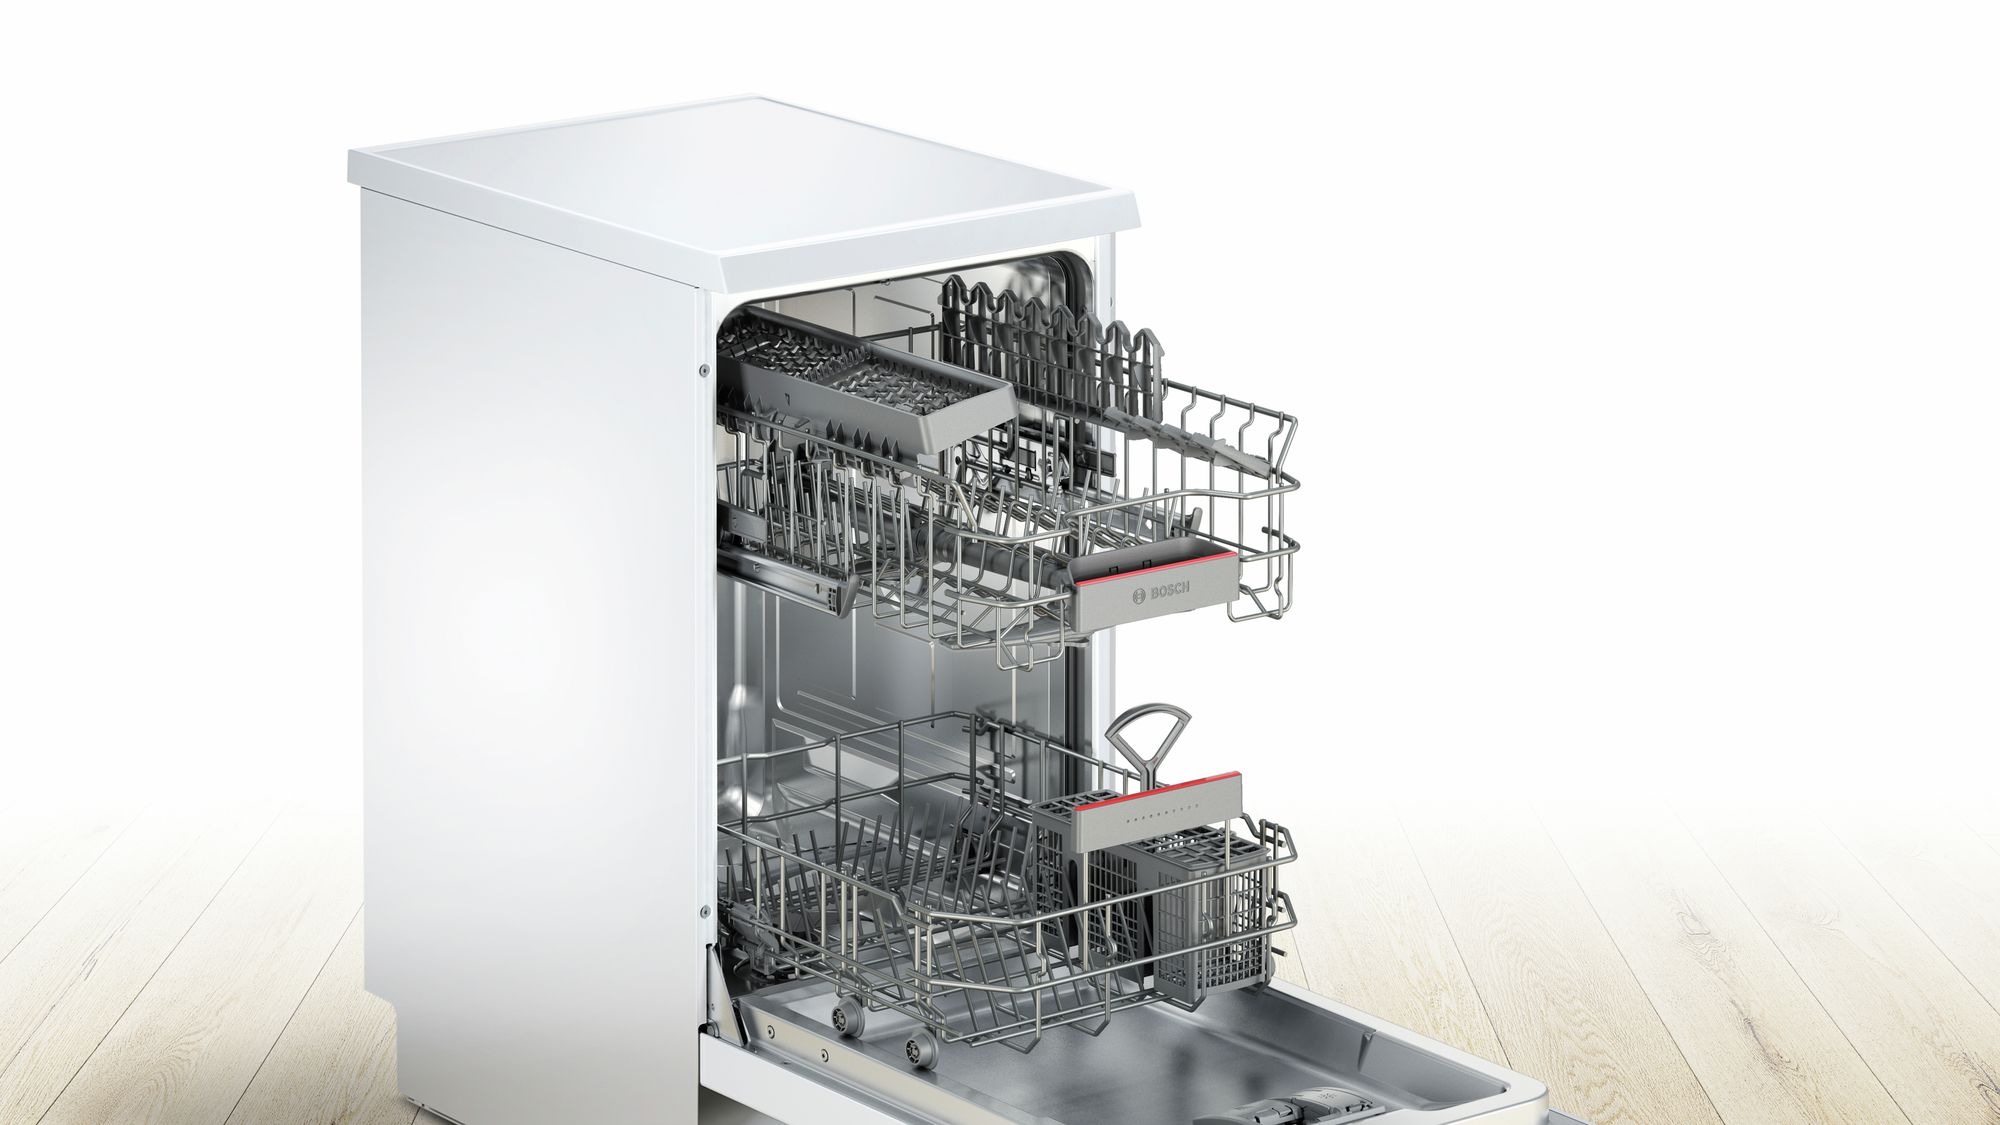 Serie | 4 SuperSilence mašina za pranje sudova, 45 cm samostalna mašina za pranje sudova, bela